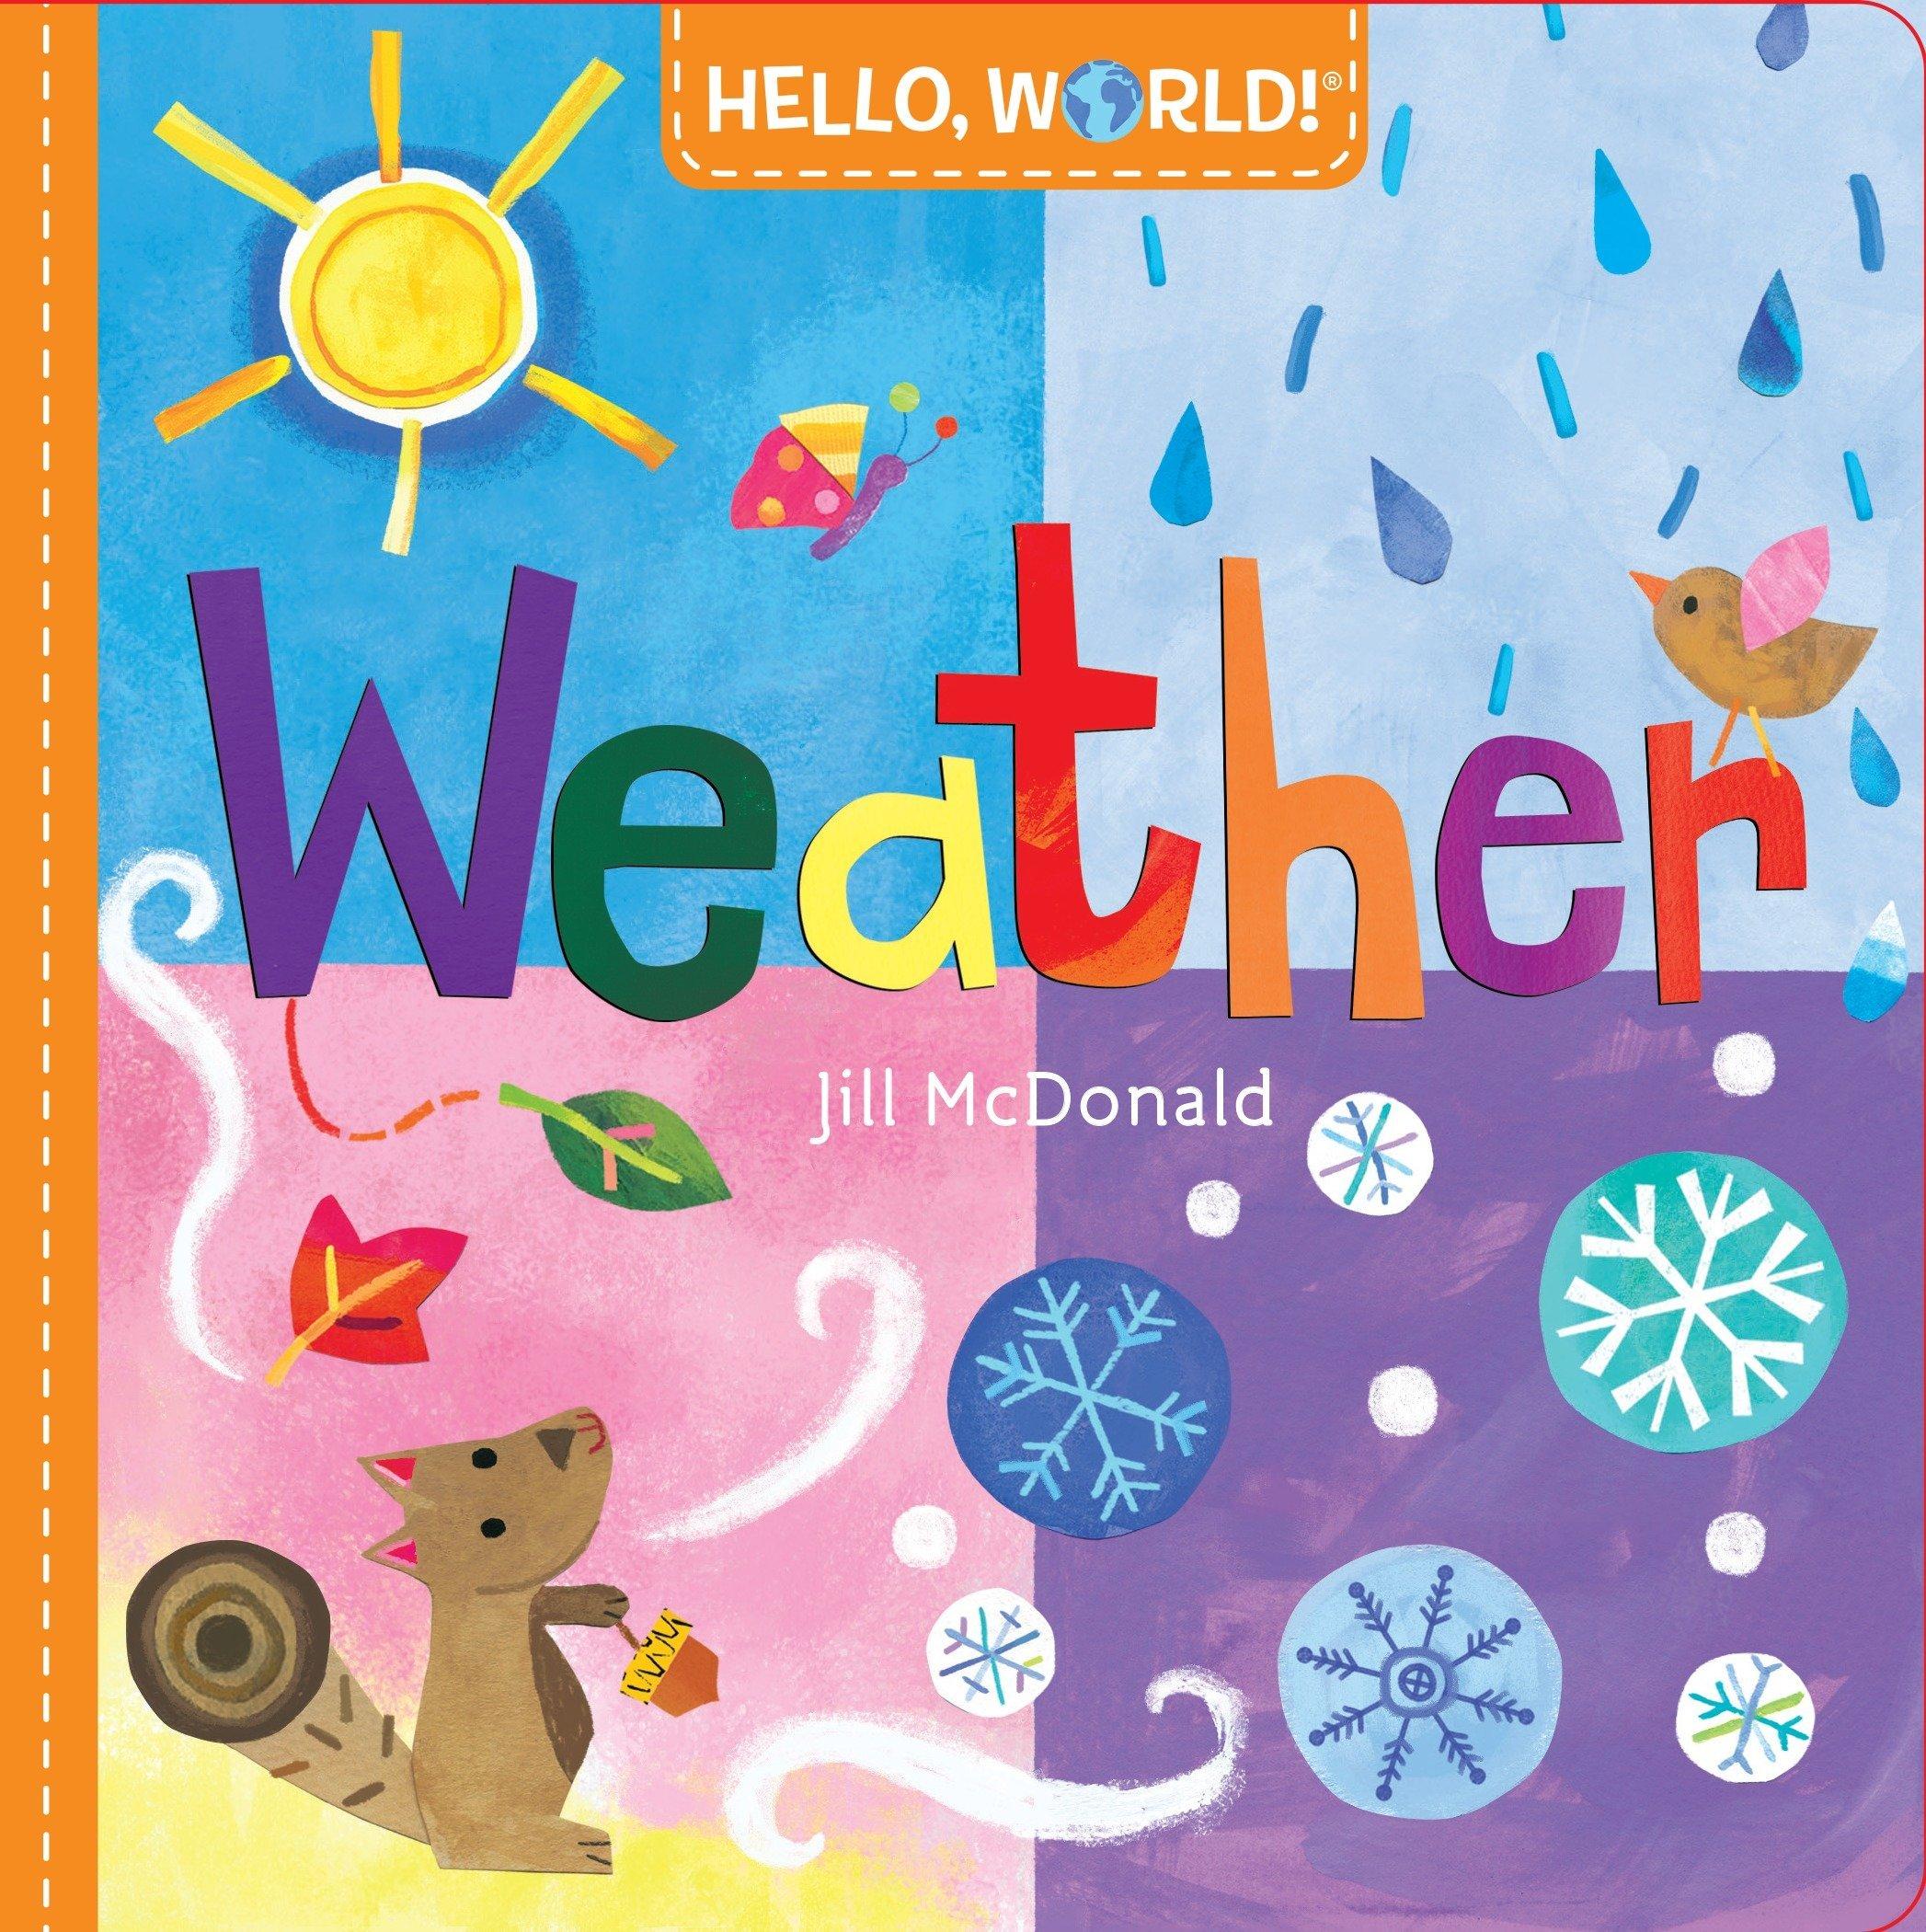 World Weather Hello